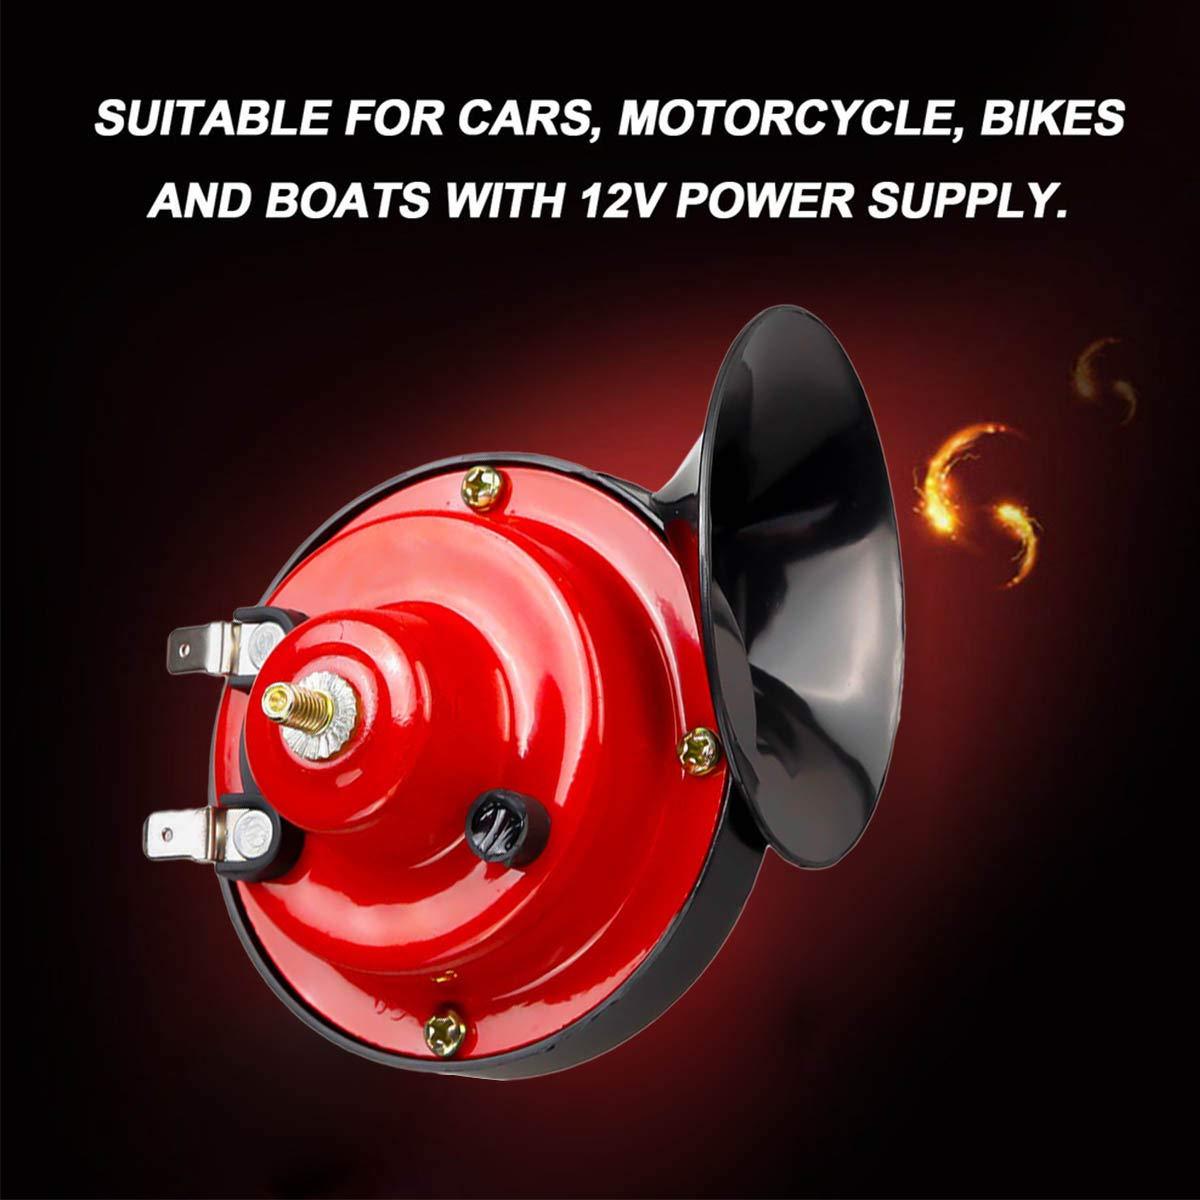 1 Pair ShineTool Car Vehicle Auto Horn Dual-tone Snail Car Horn Universal Electric Air Horn 12V 130db for Cars Truck Motorcycle